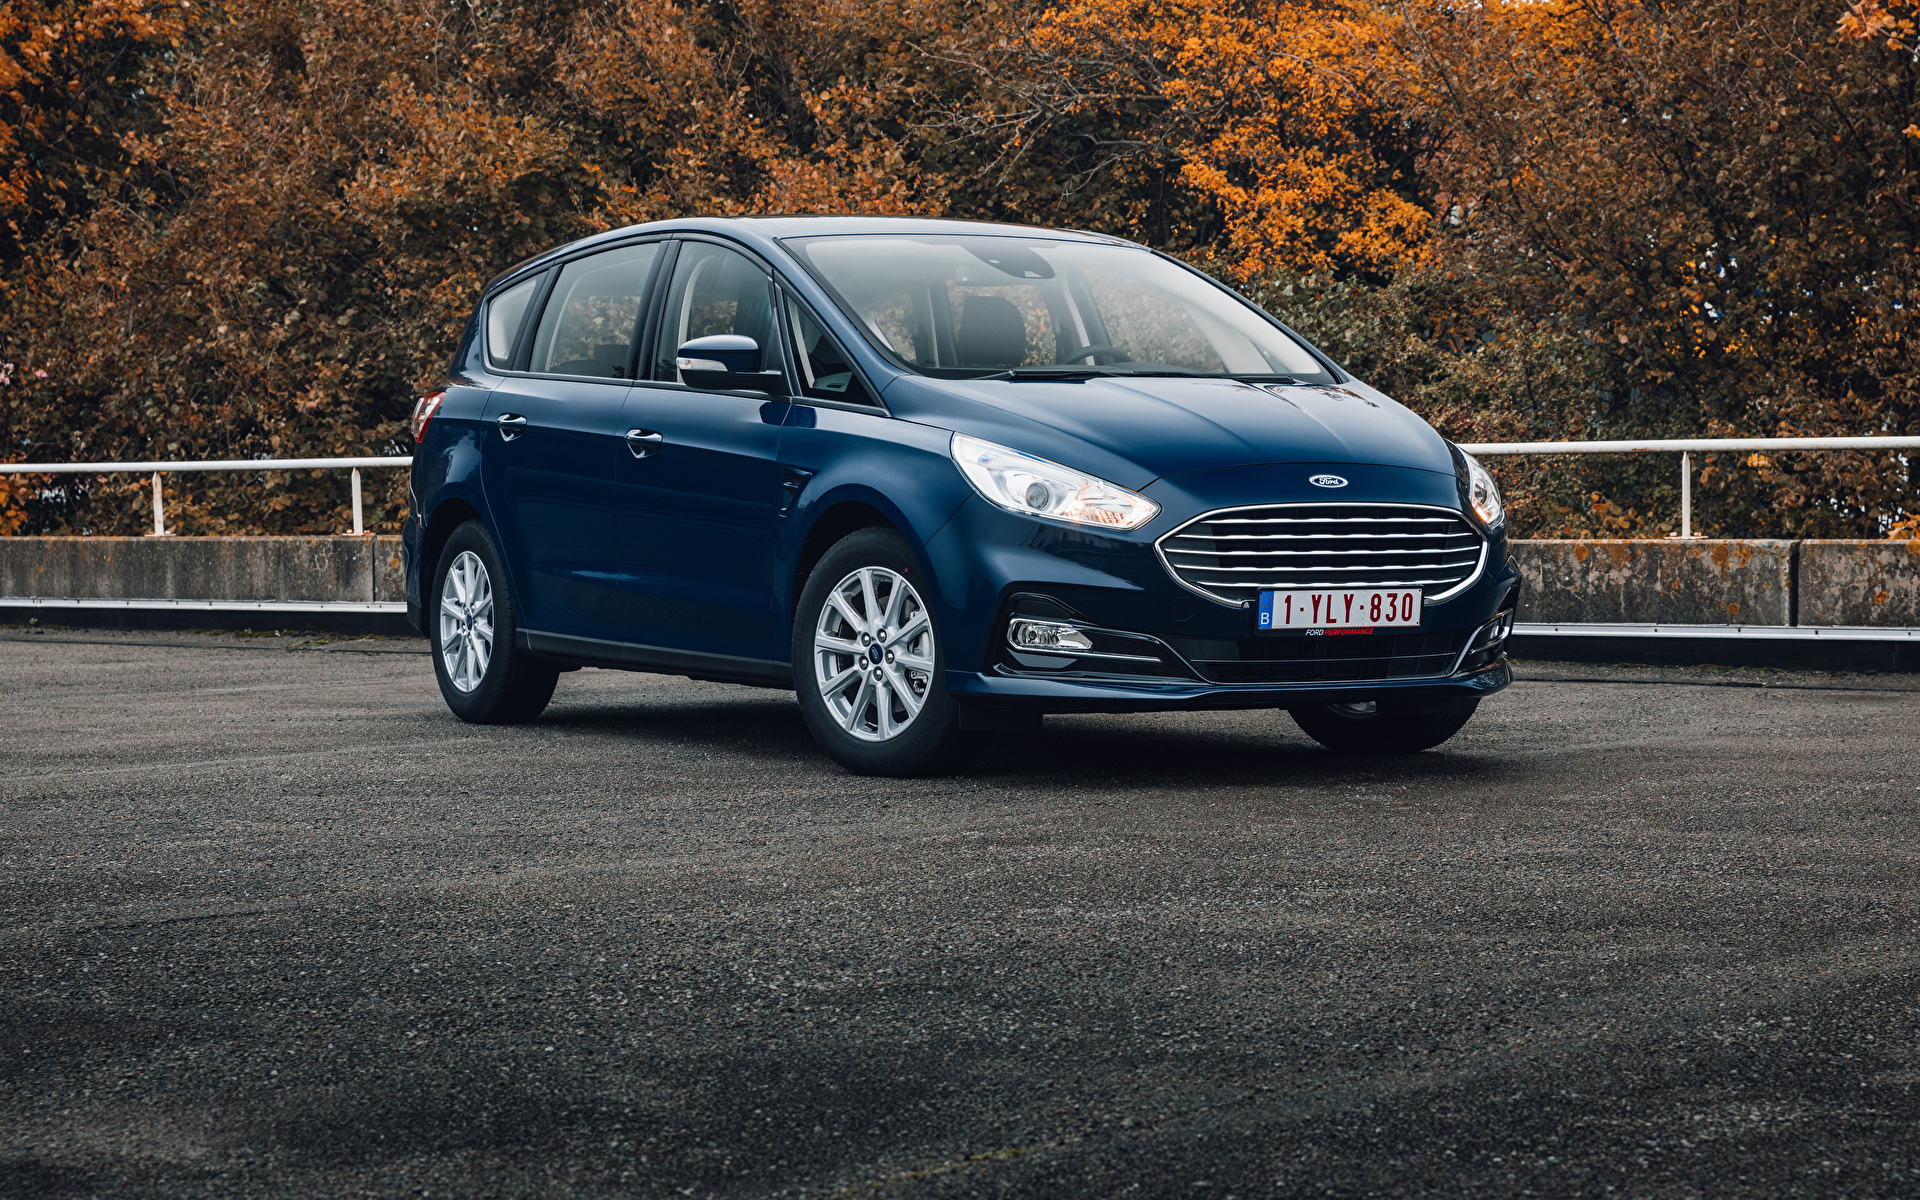 Foto Ford Kombi S-MAX, 2019-- Blau Autos Metallisch 1920x1200 auto automobil